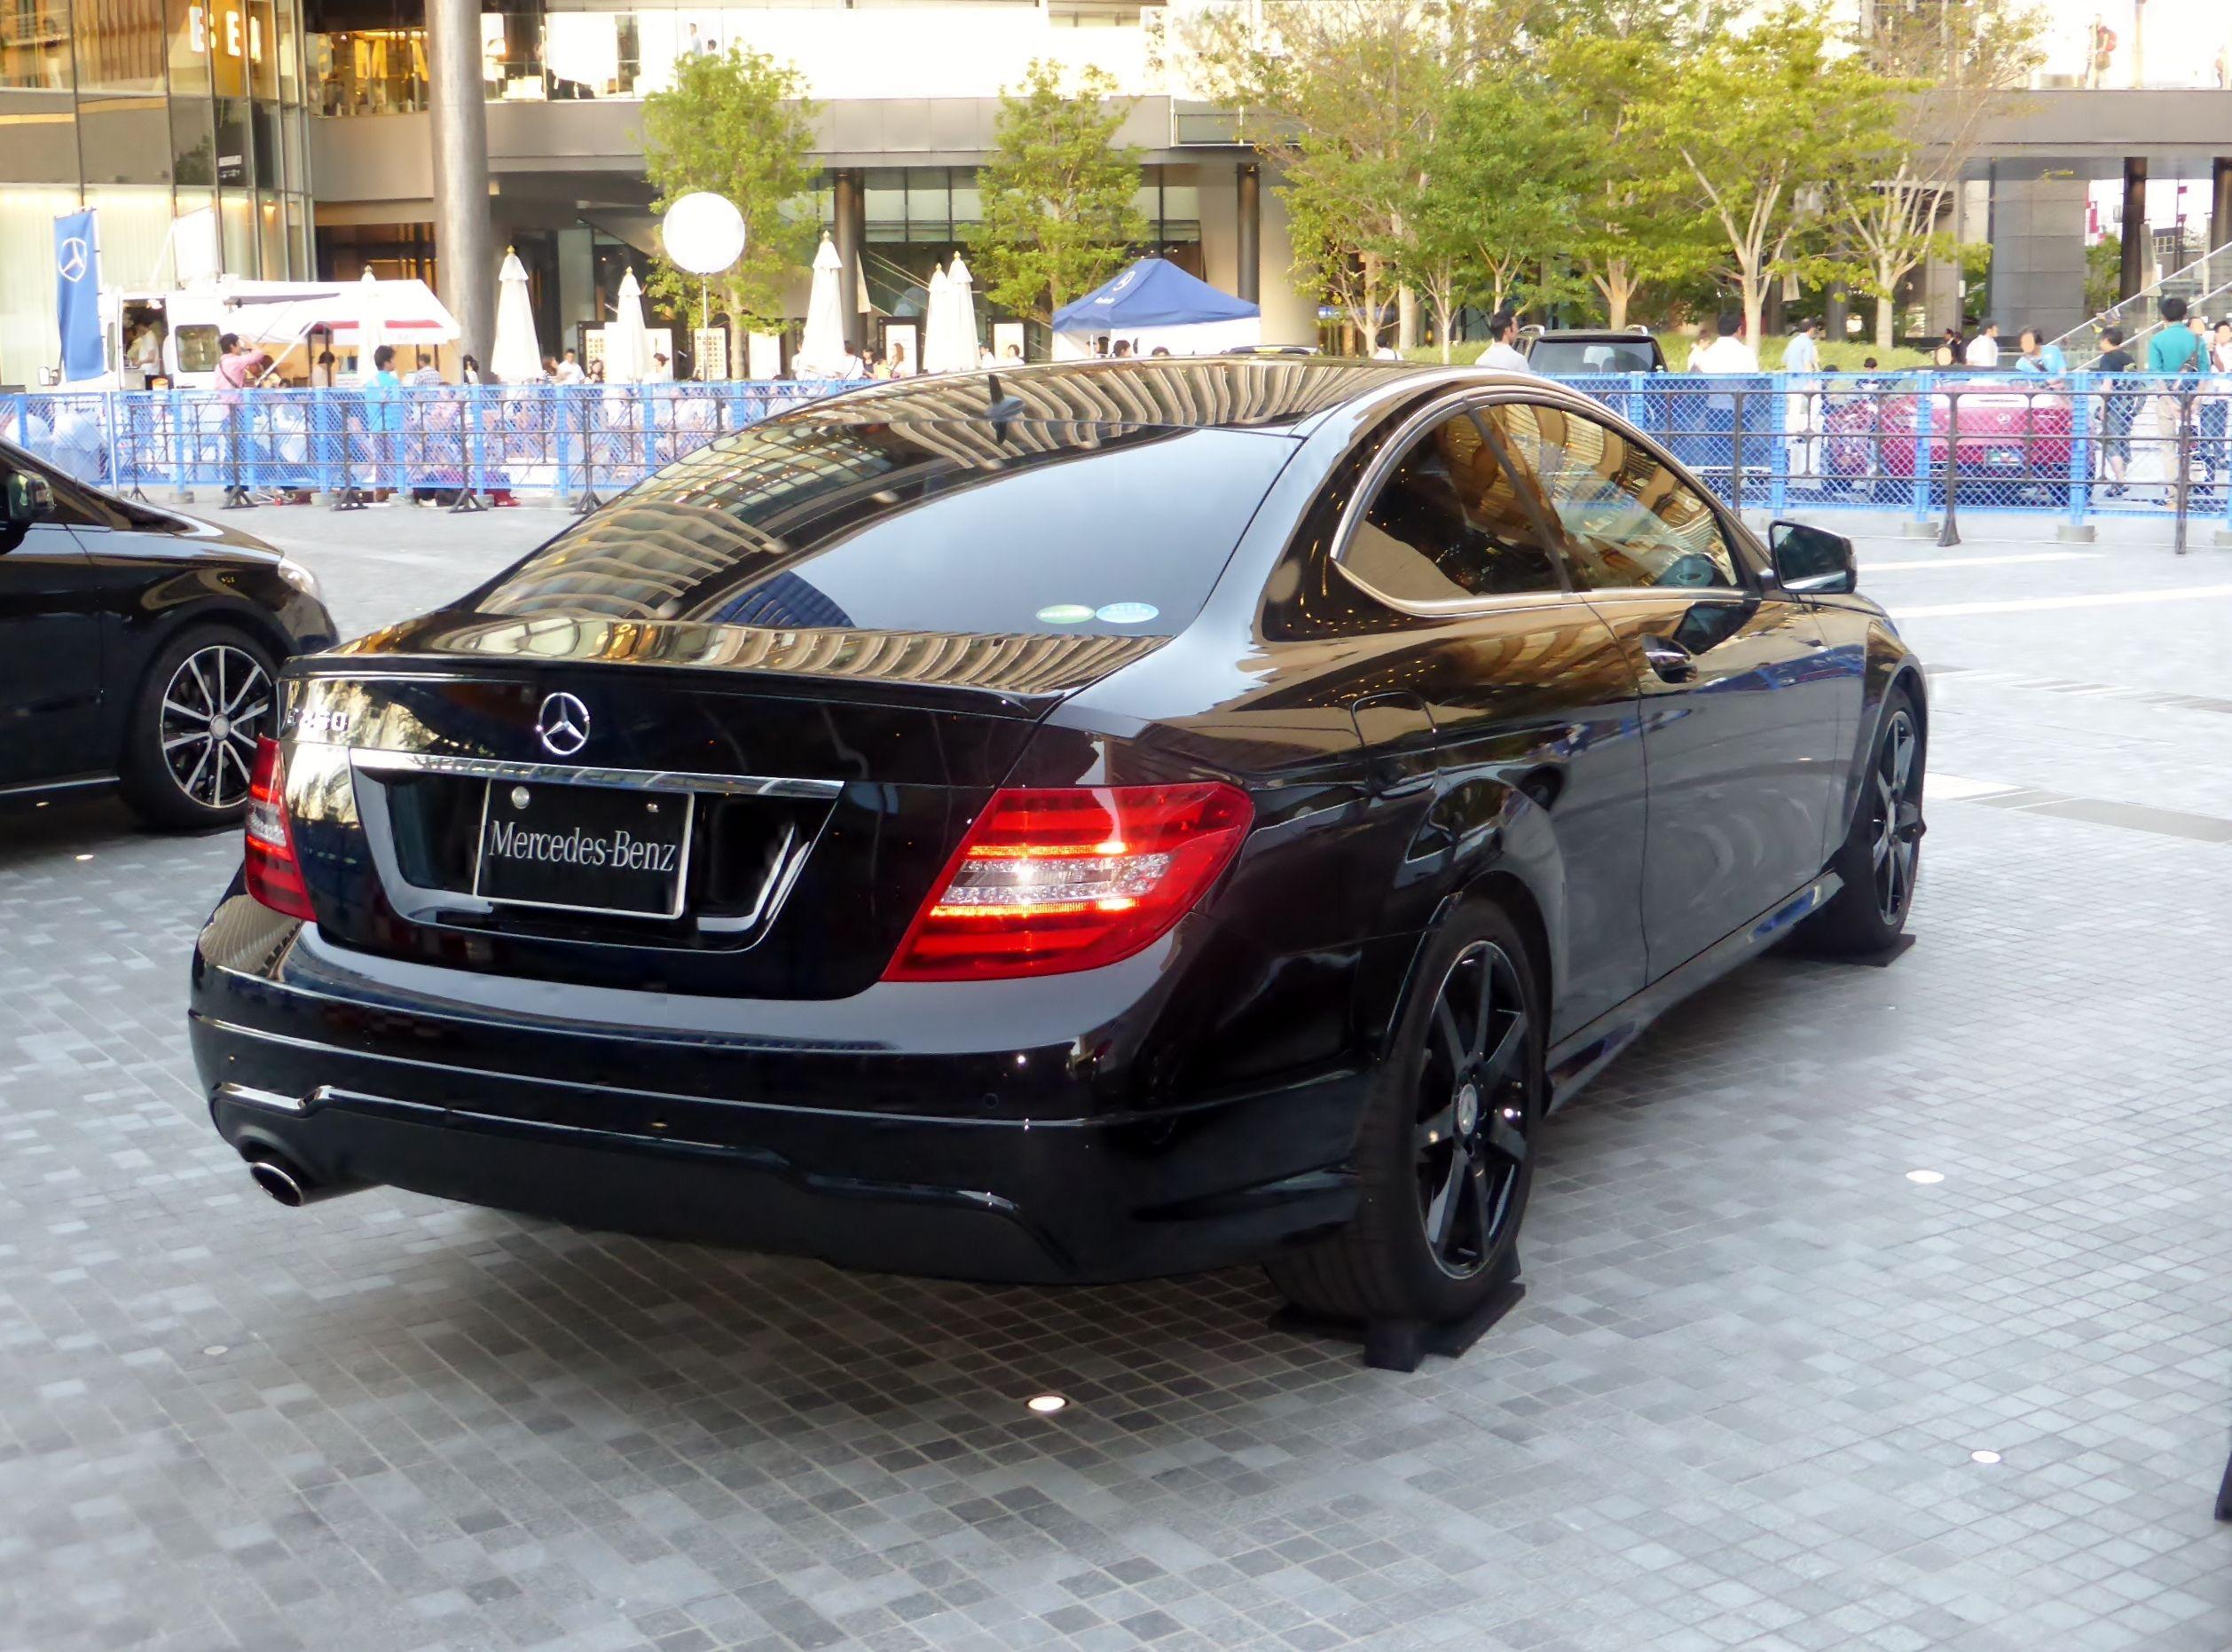 Benz C250 Coupe Black Benz Bmw Car Bmw